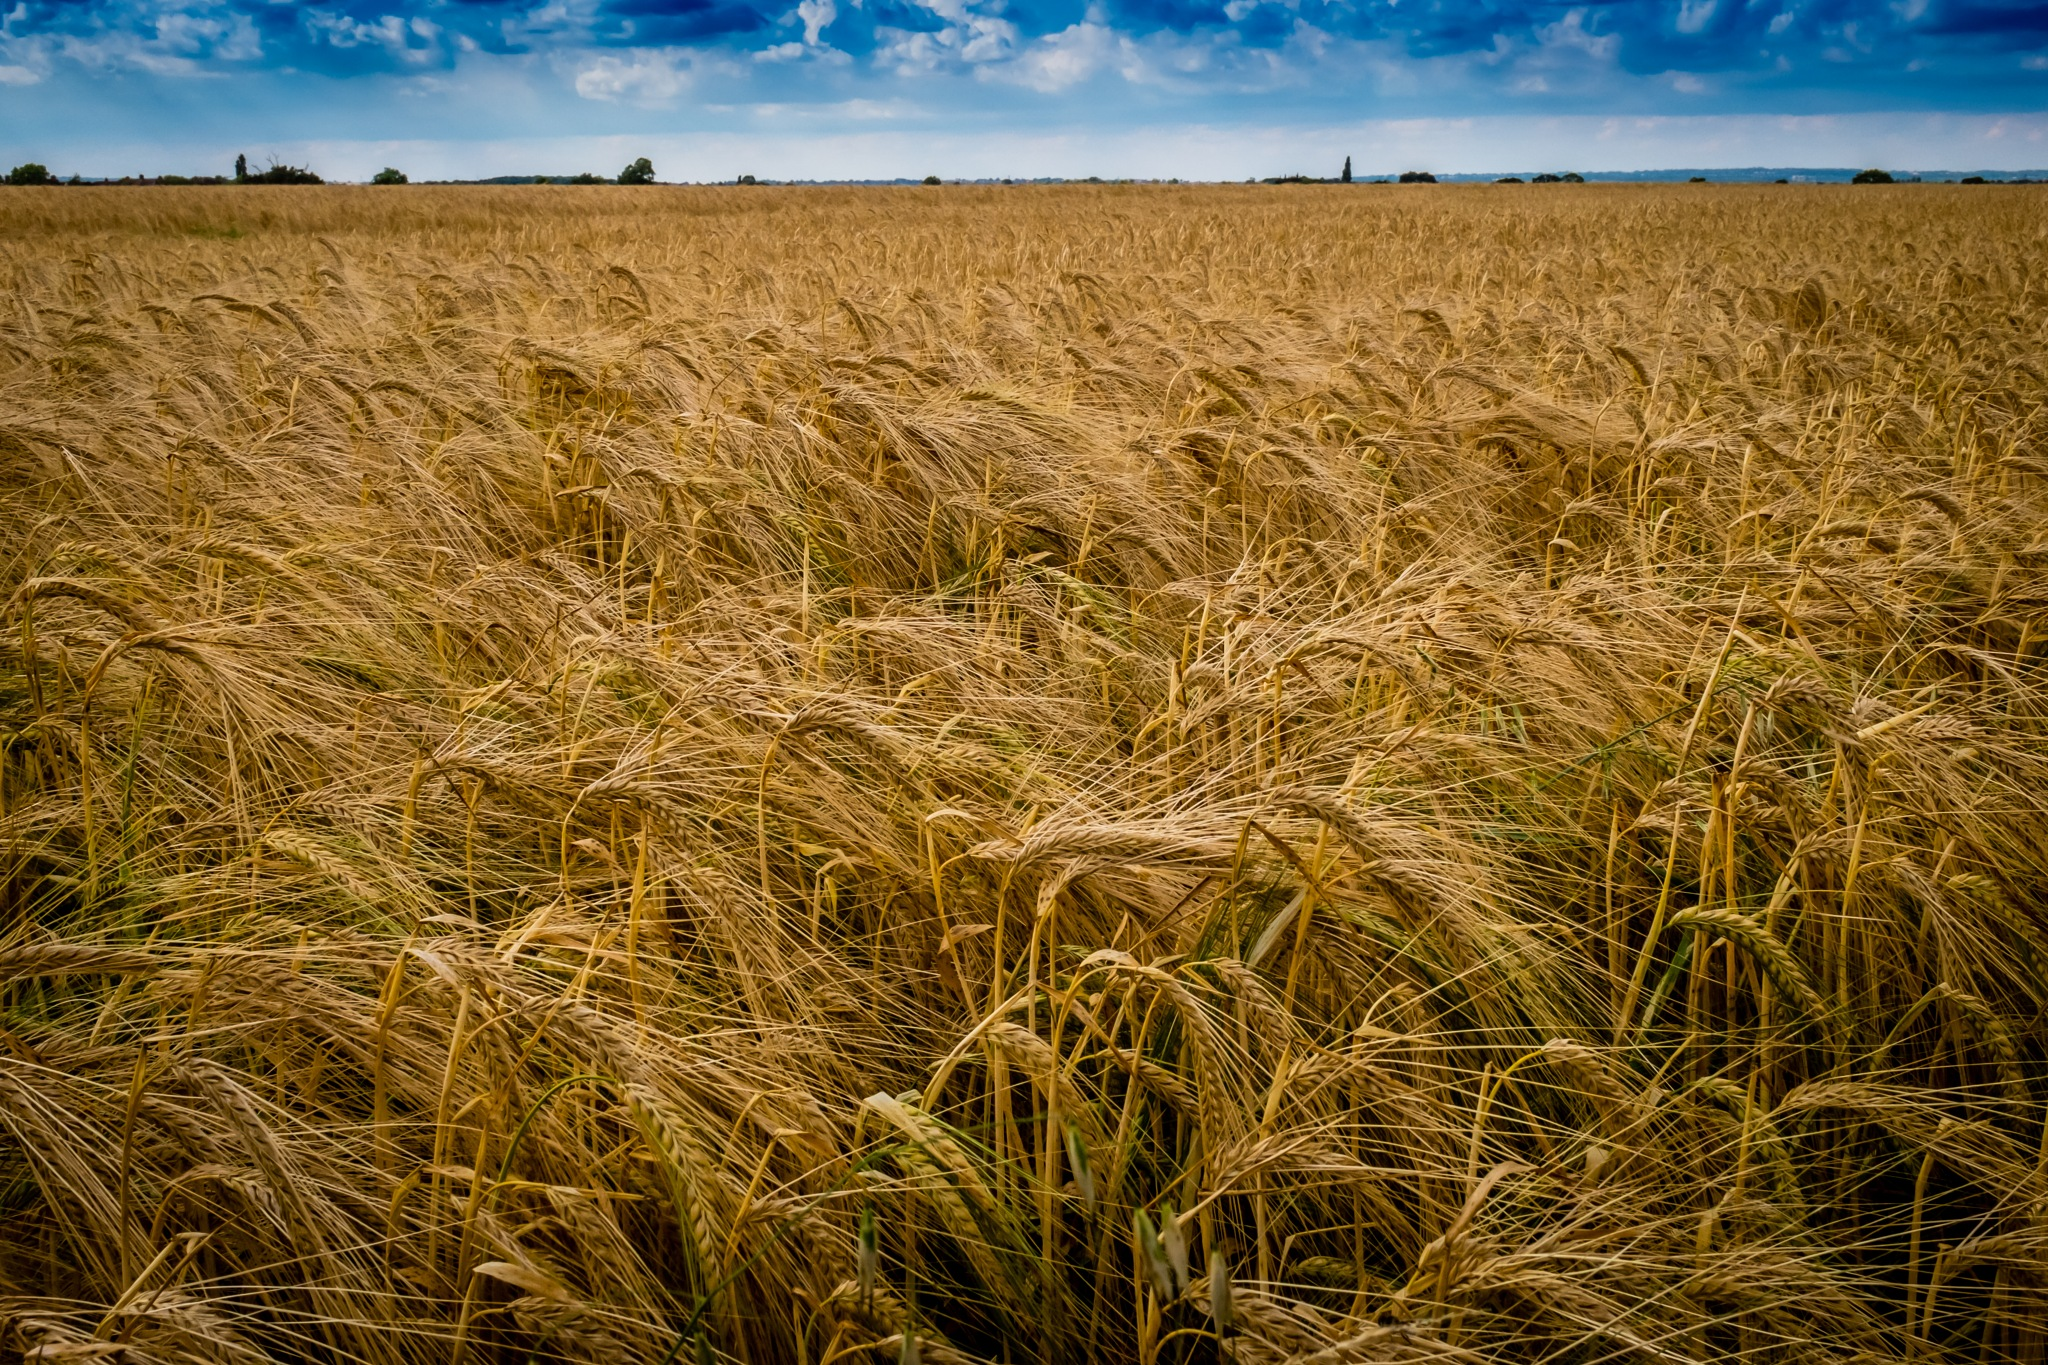 Wind in the Barley by DRJonsey